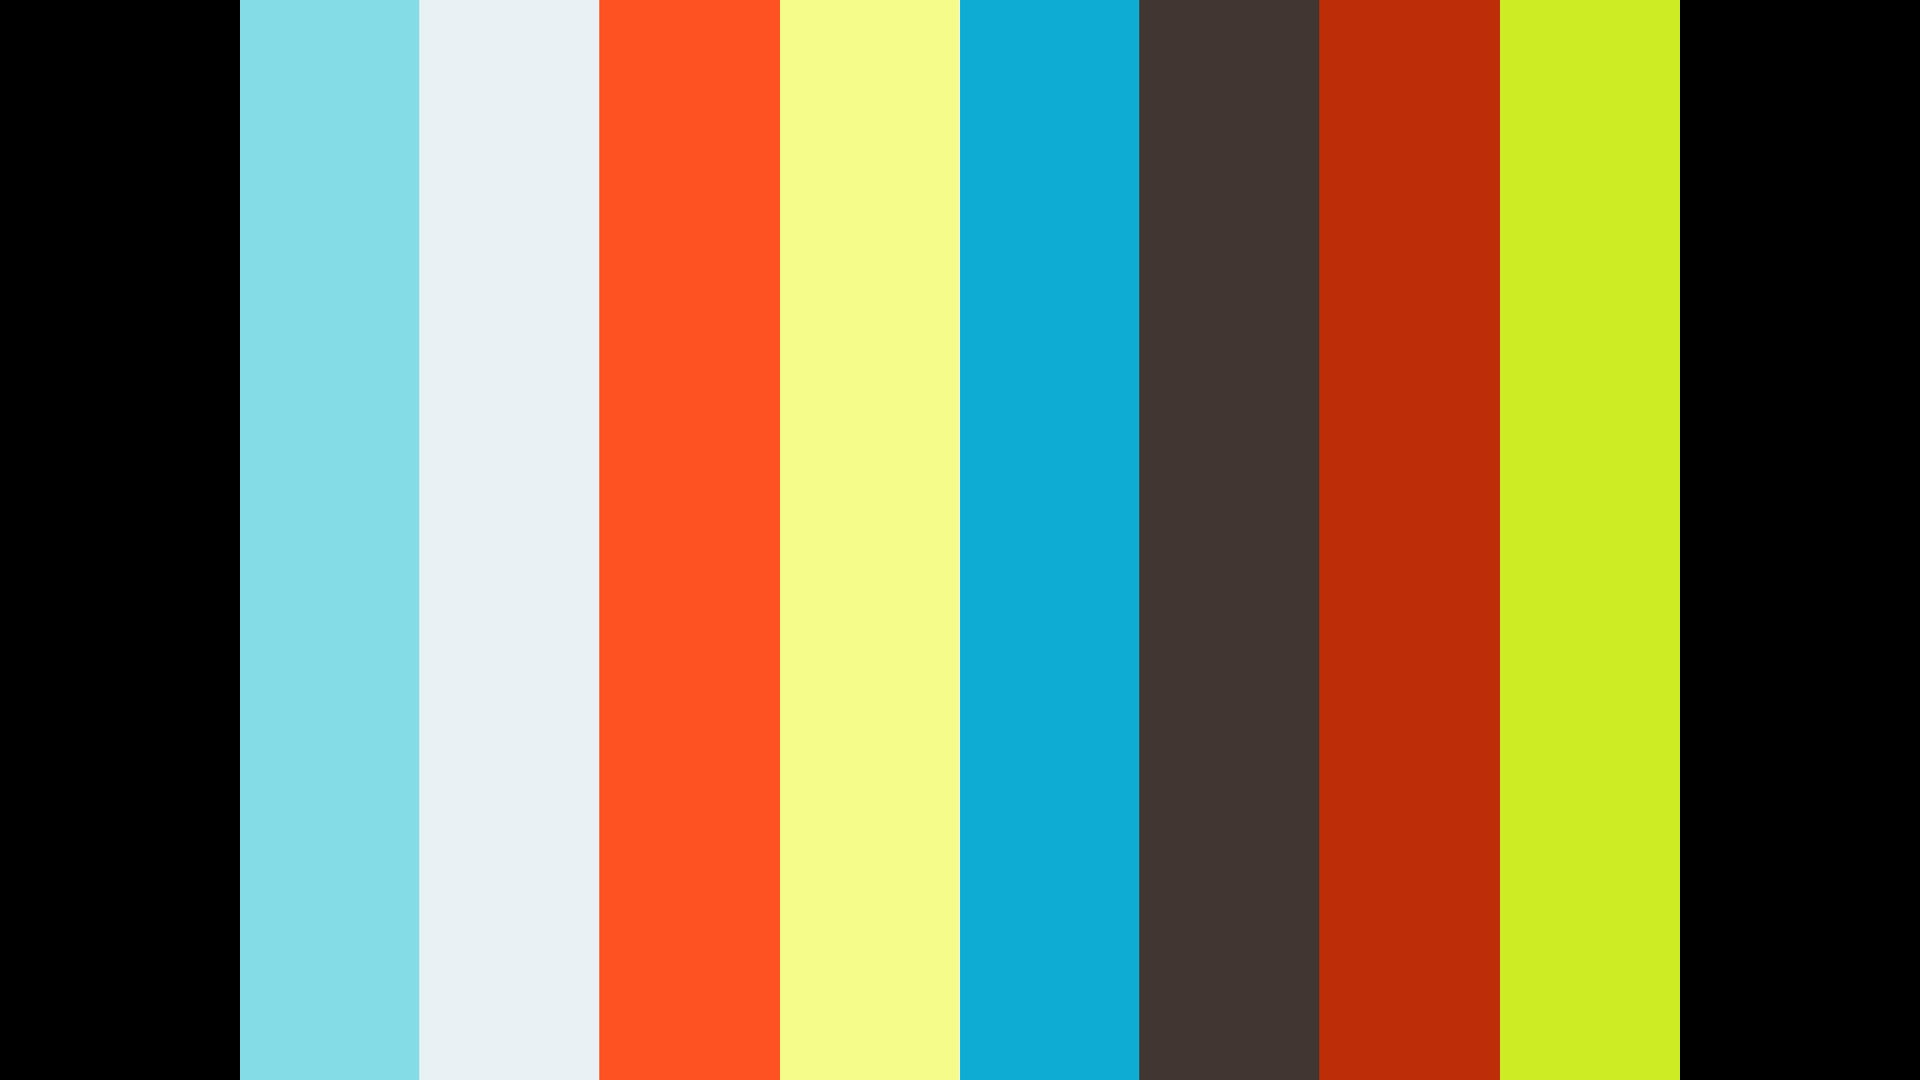 Jeroen Simons - Curves Compilation Testimonial